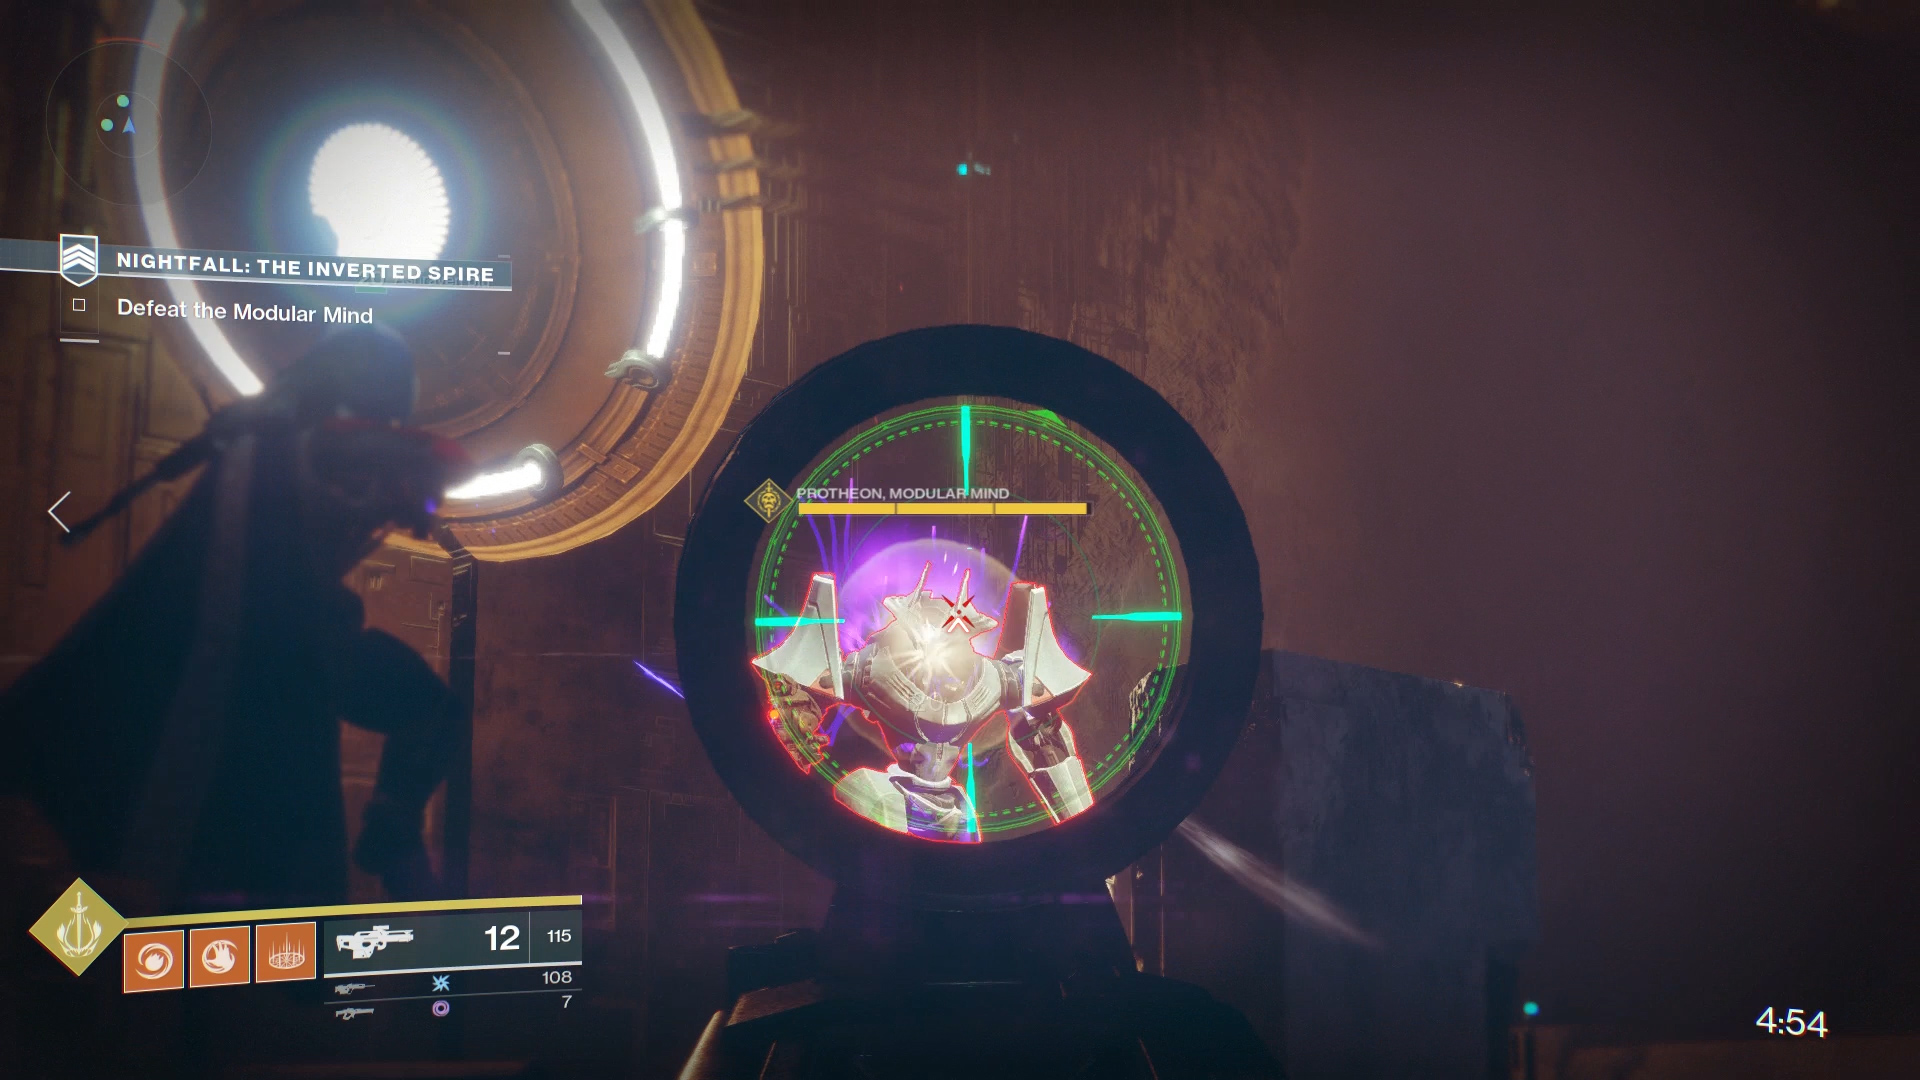 Destiny 2 - The Inverted Spire Nightfall Guide   Shacknews